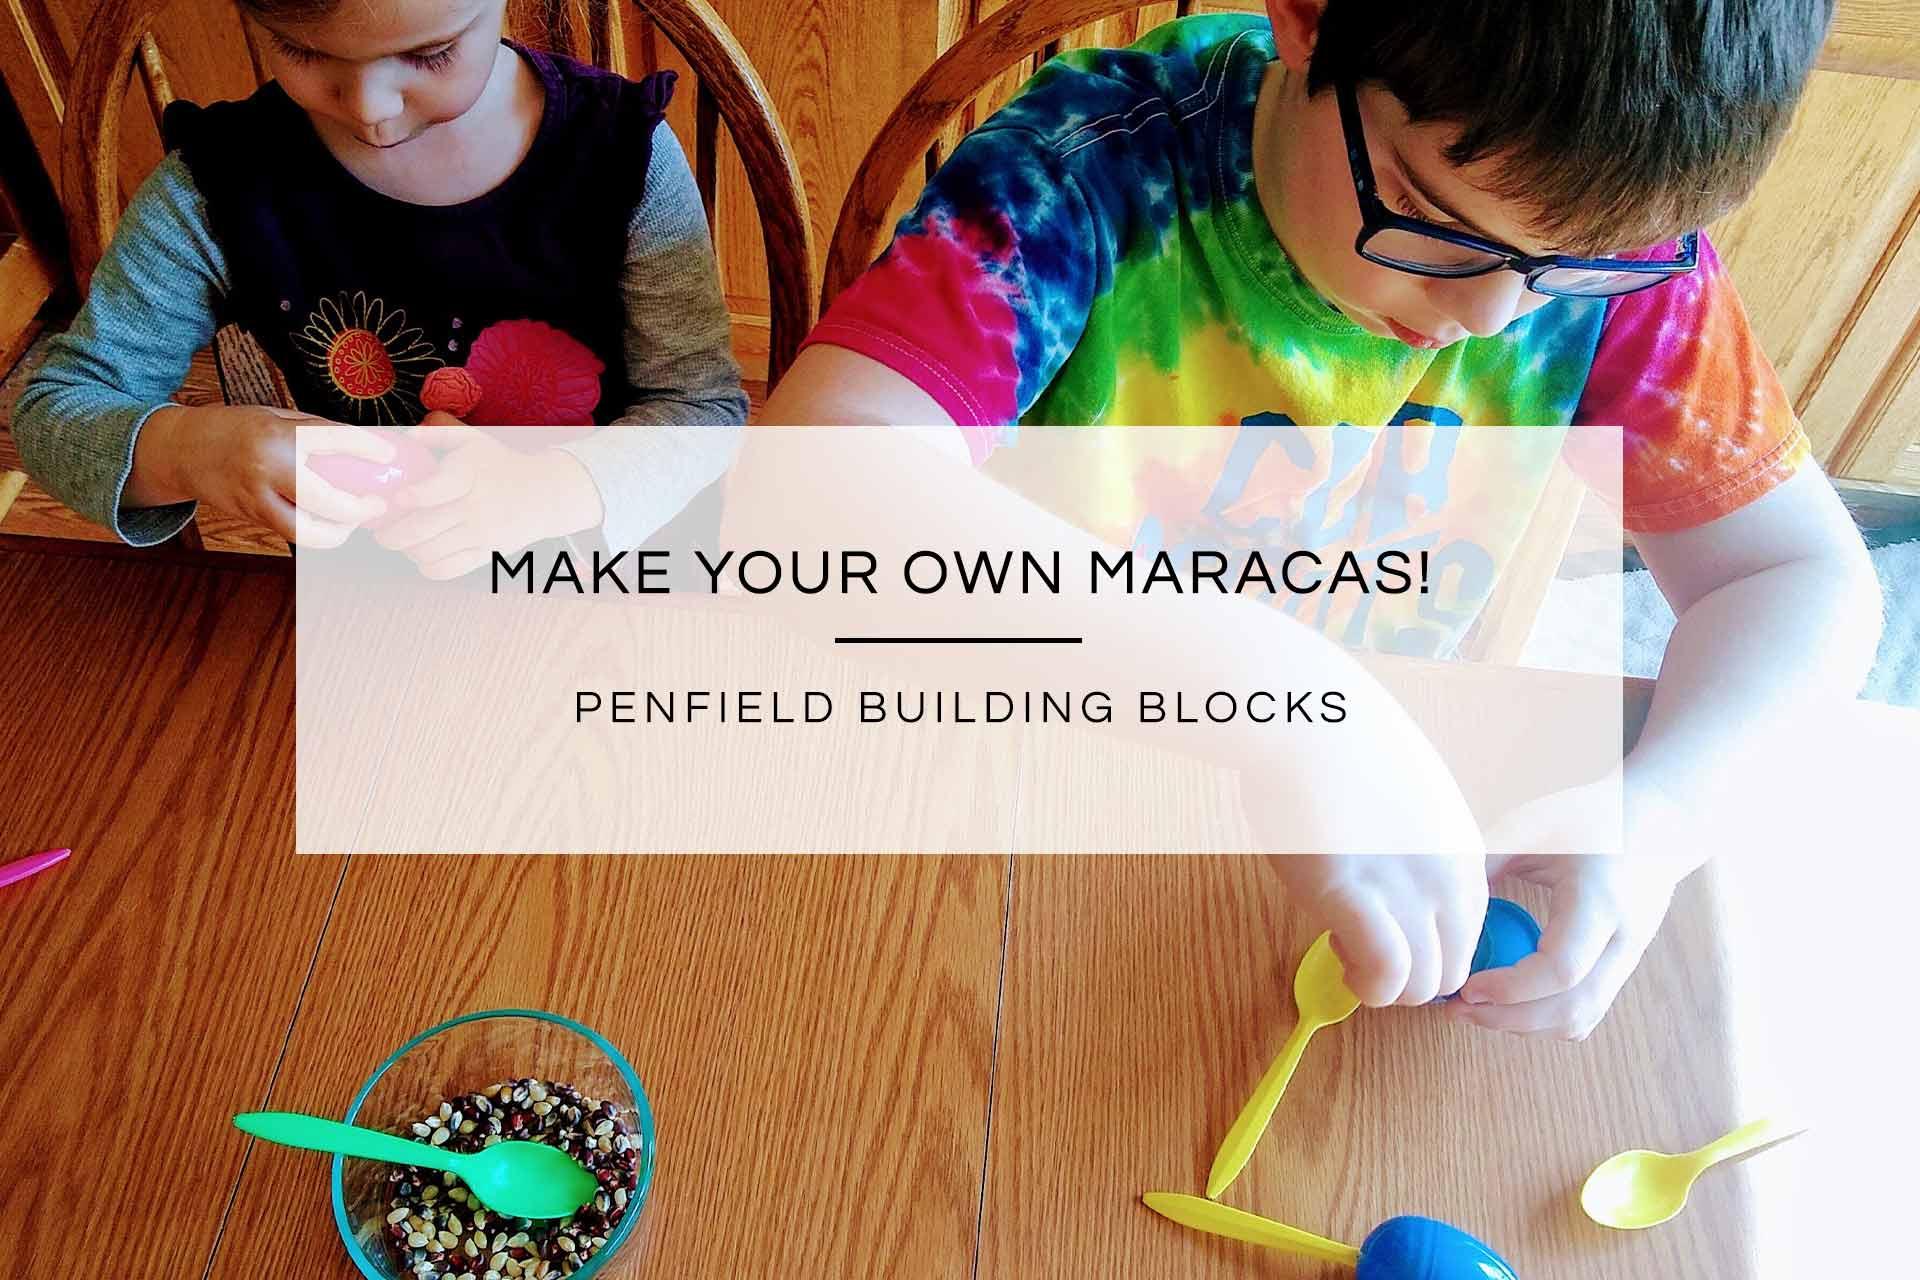 Make Your Own Maracas! | Penfield Building Blocks